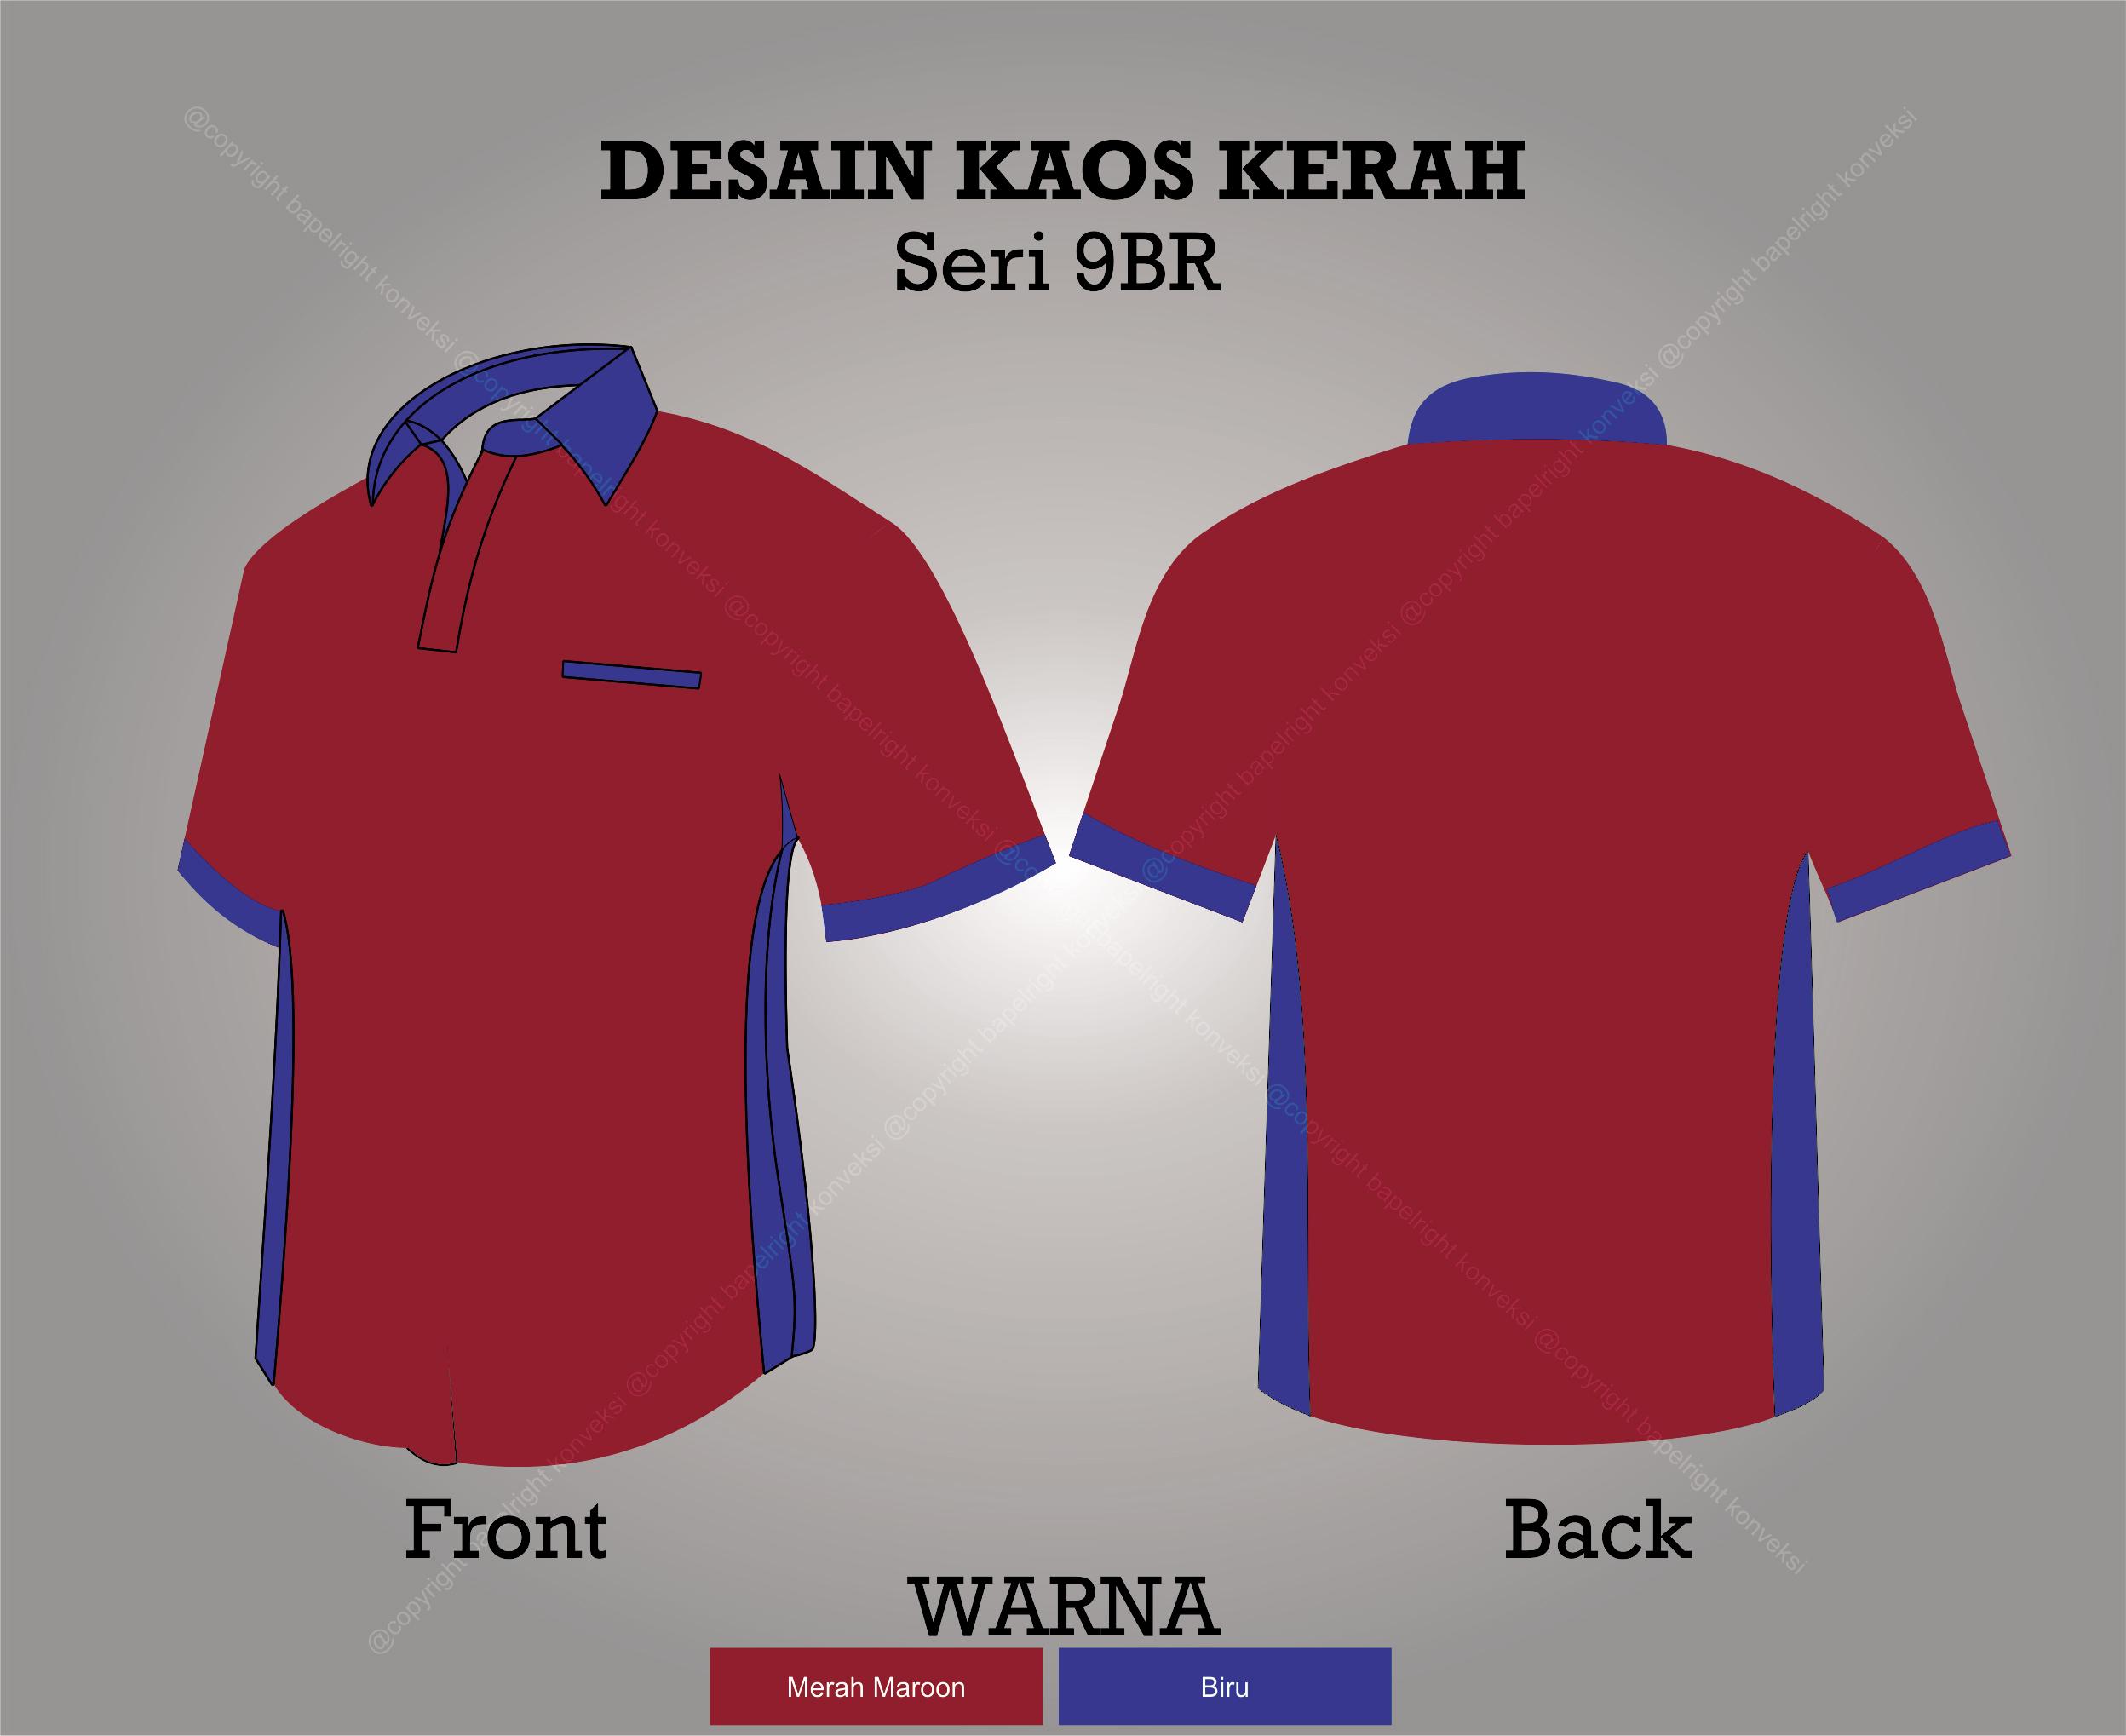 Desain Kaos Kerah merah dan biru